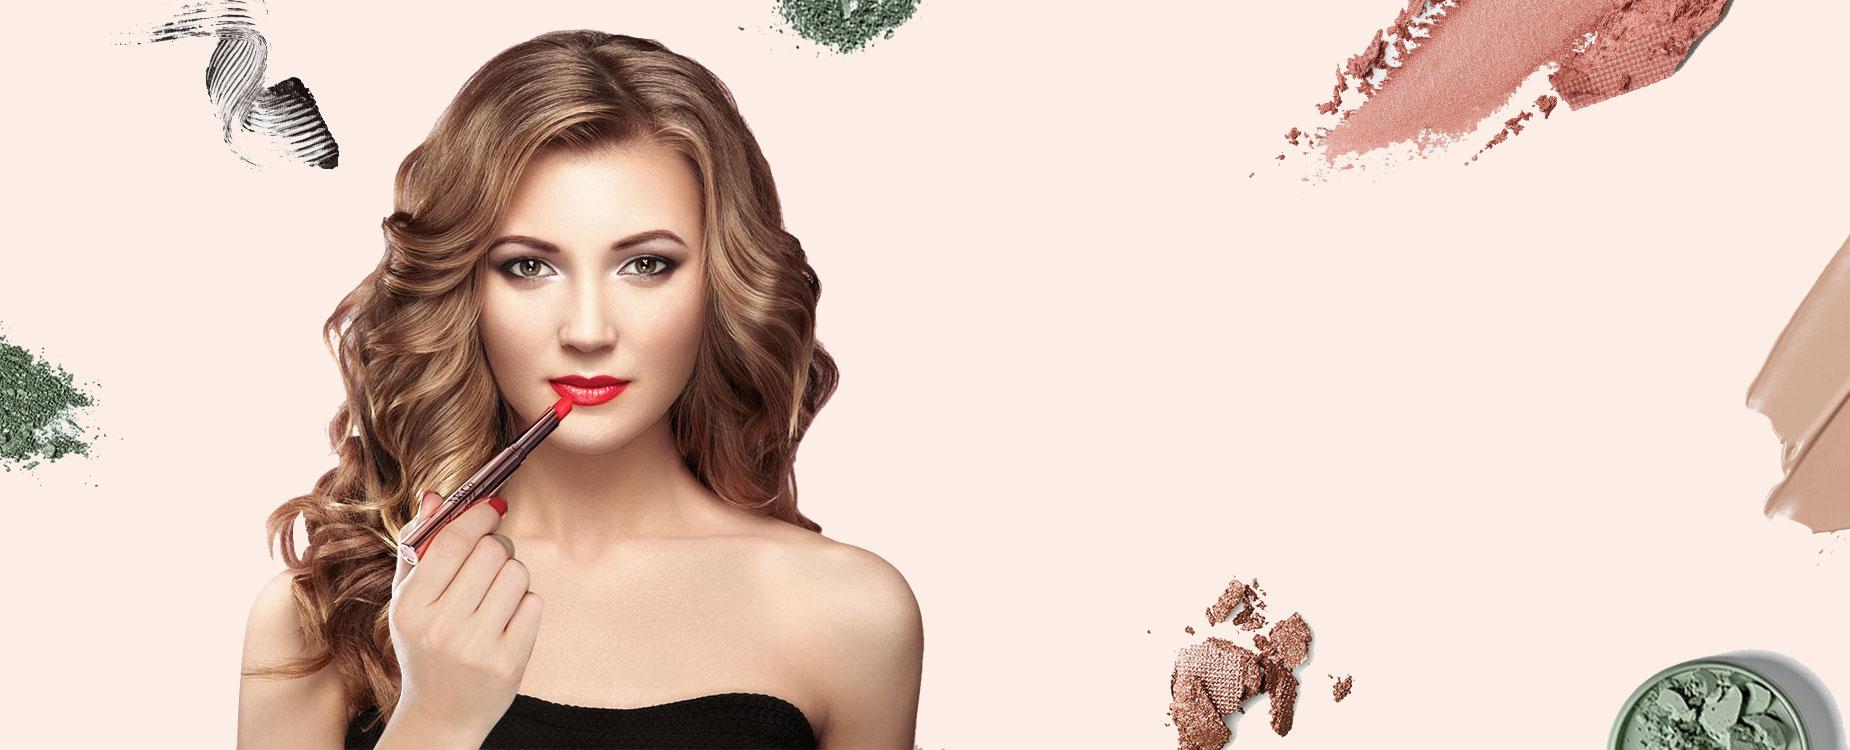 Glamour Lipstick